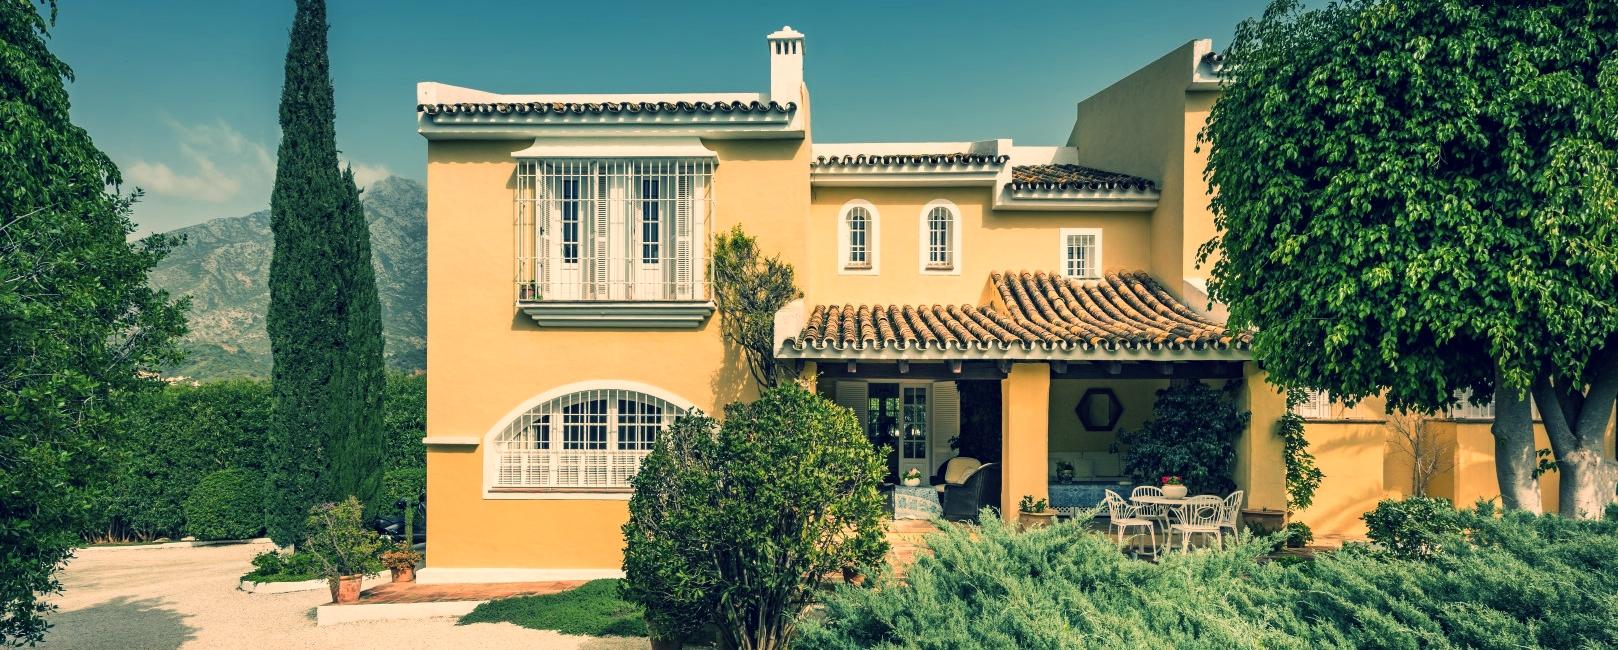 Villa - Golden Mile - Marbella - Real Estate - Alfonso Lacruz - Keller Williams